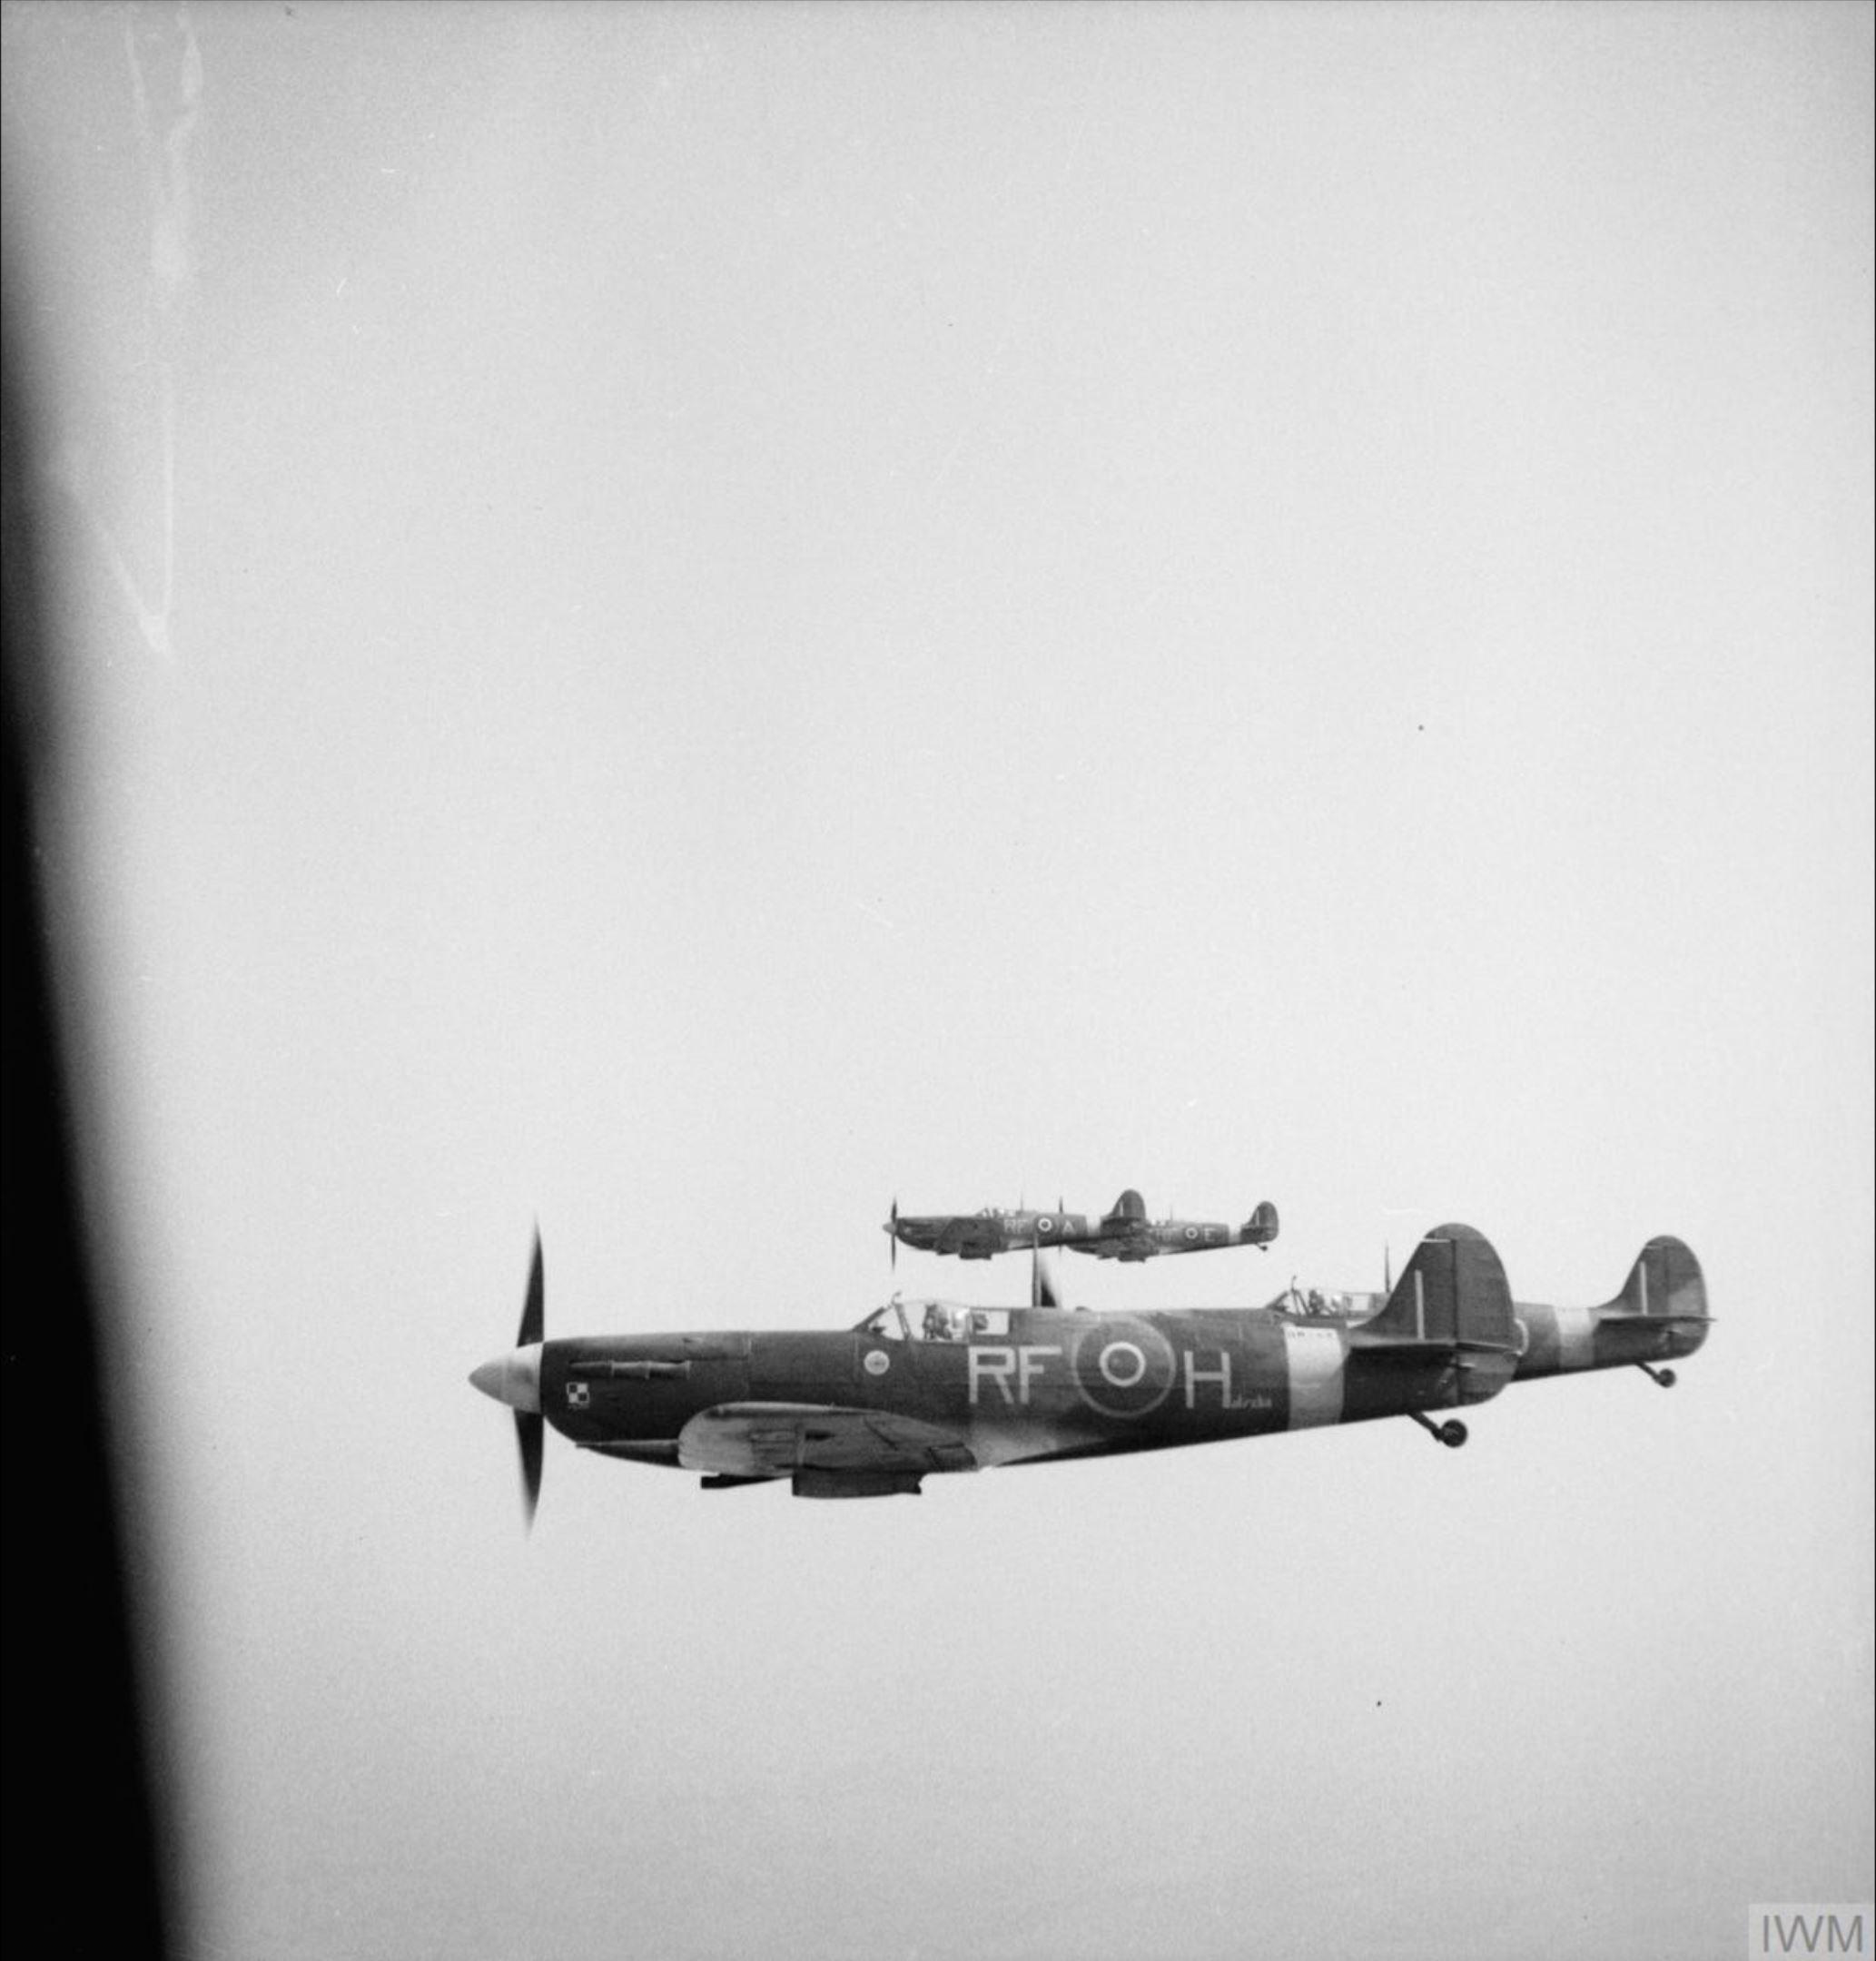 Spitfire MkVb RAF 303 Polish RFH BM144 escorting a B 17 carrying Montgomery 17th May 1943 IWM 01